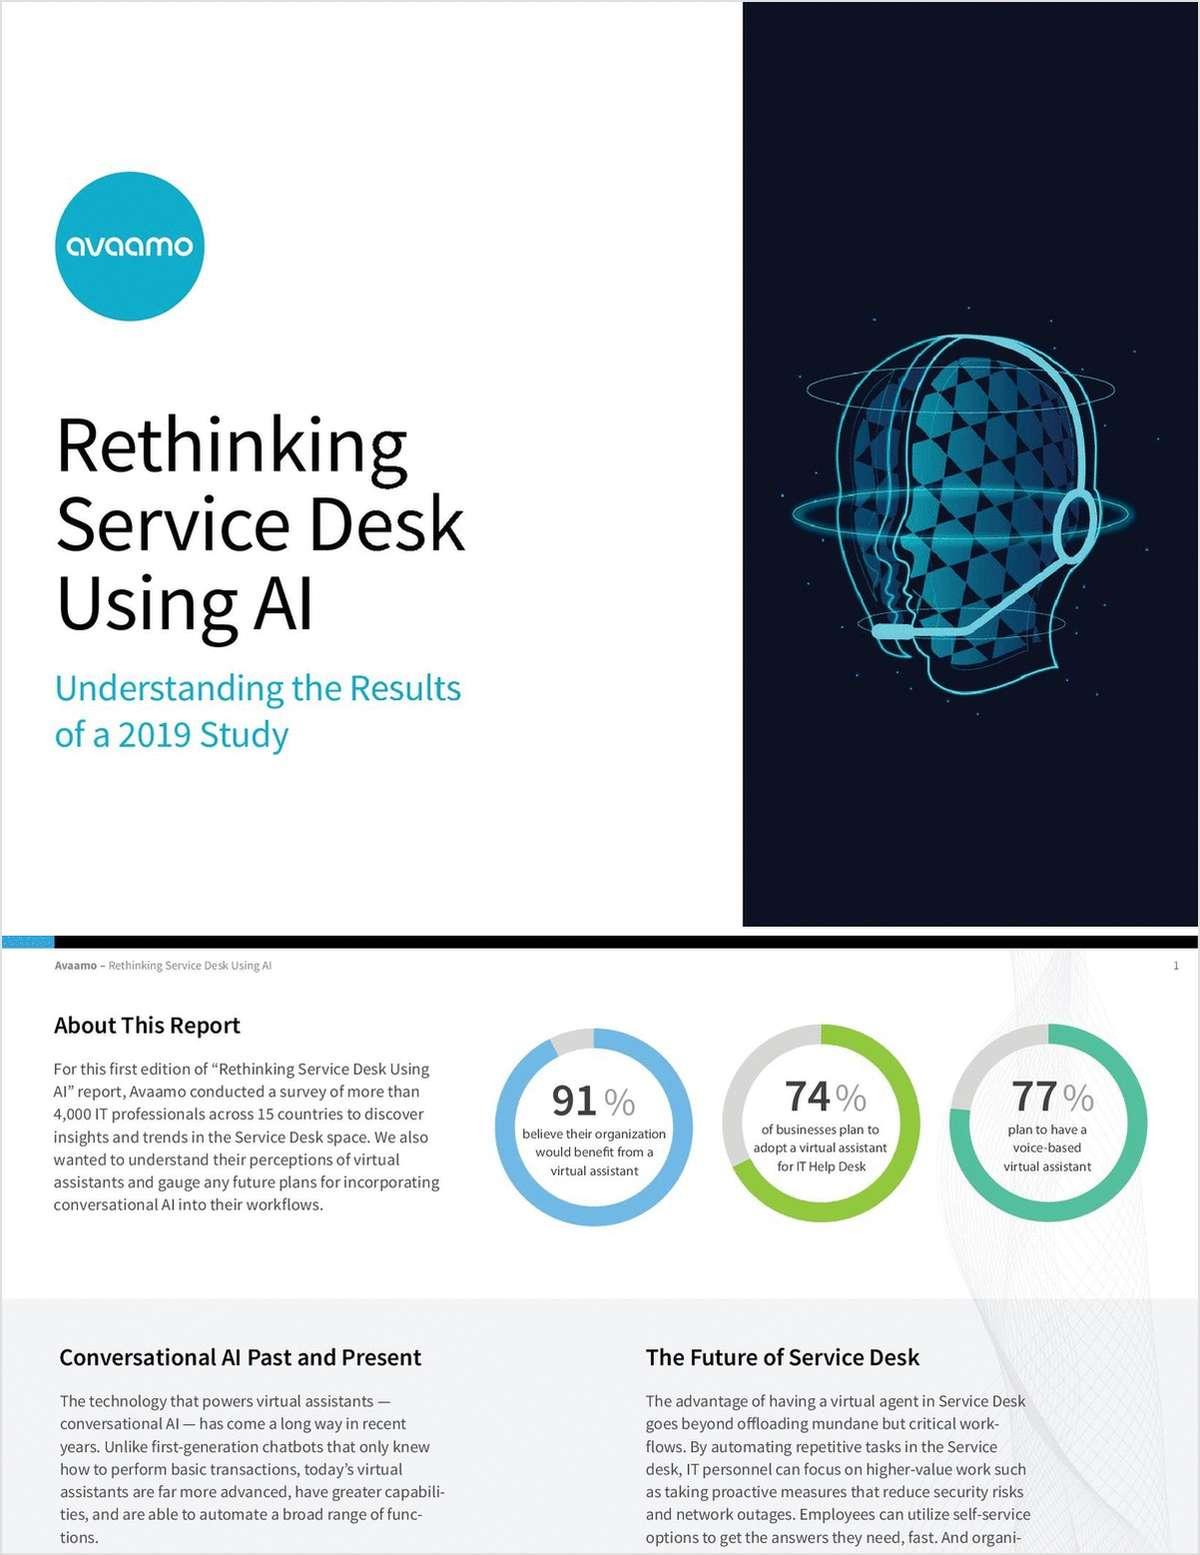 Rethinking Service Desk using AI